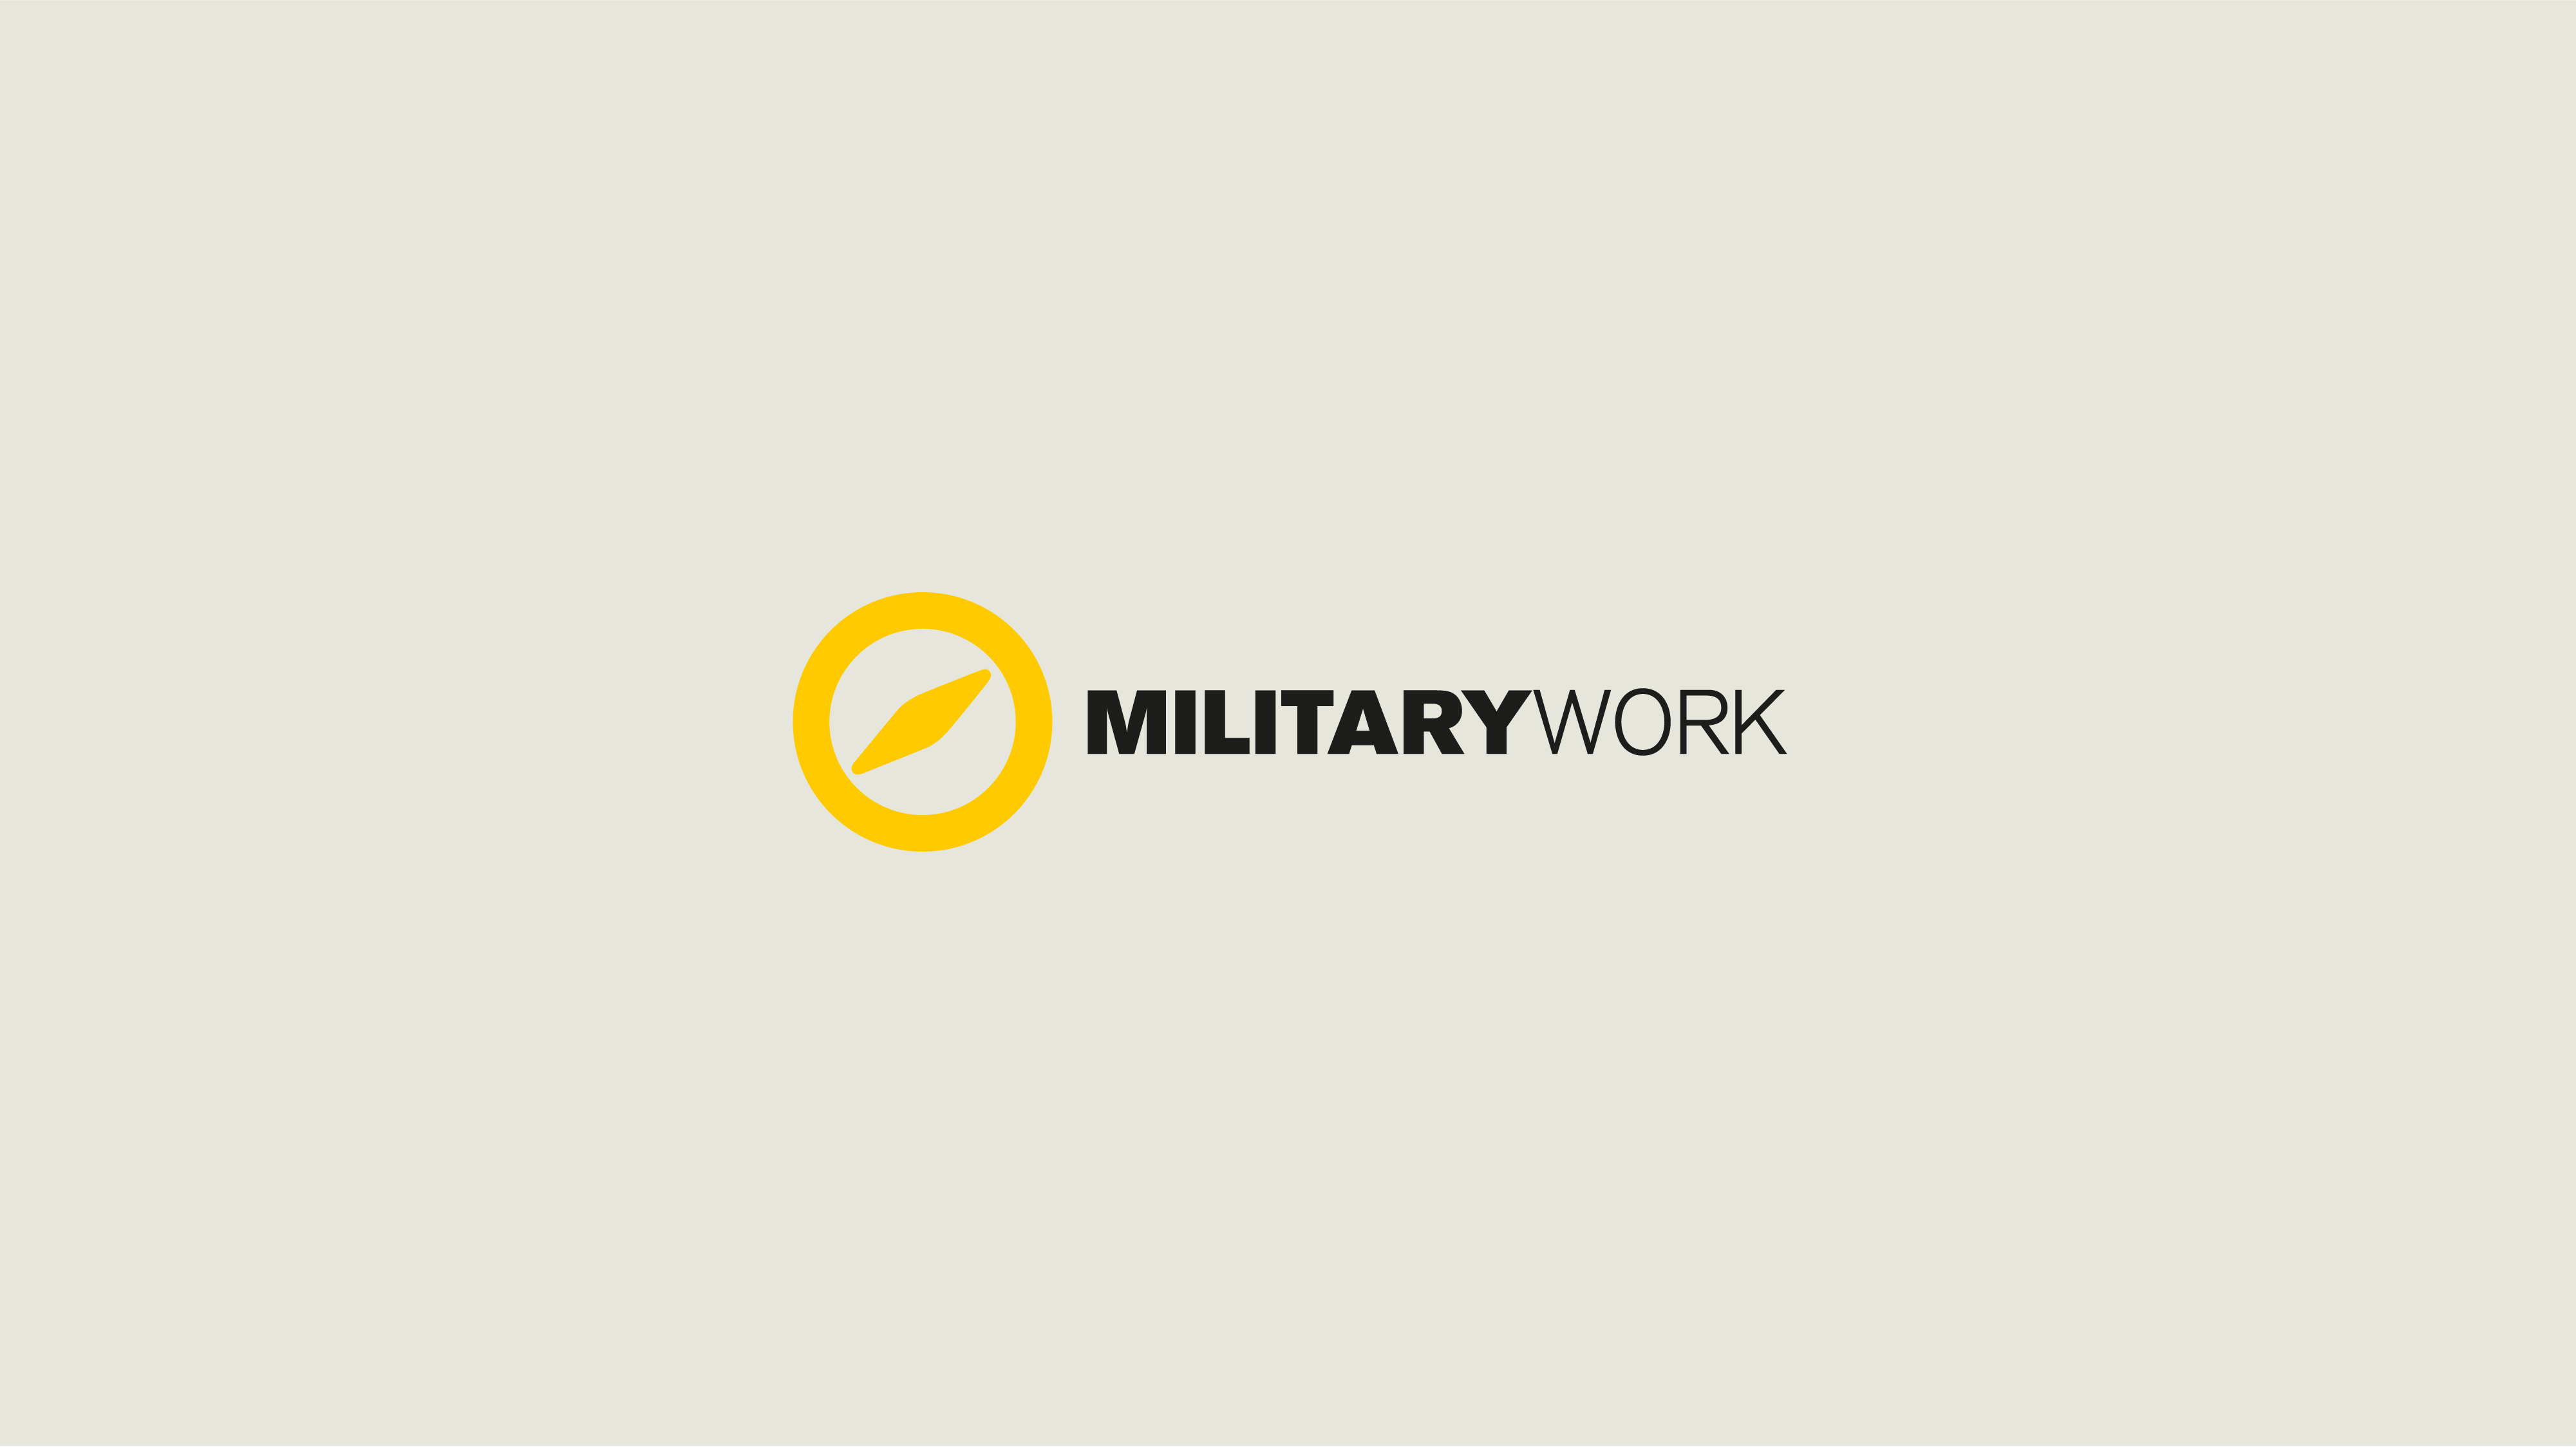 3.0 Military Work Storisell Produktionsbolag Argument